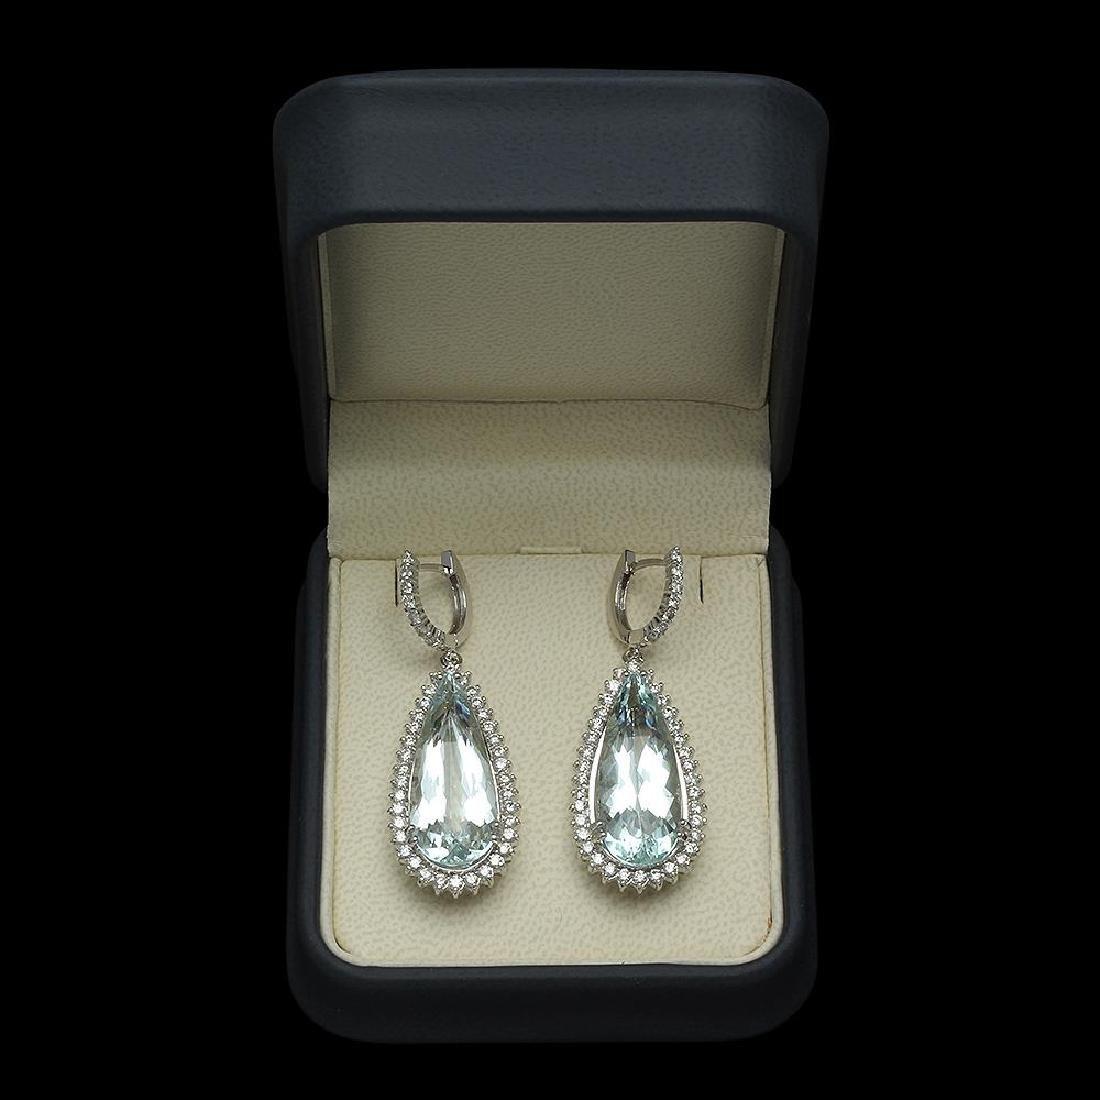 14K Gold 23.10ct Aquamarine 2.50ct Diamond Earrings - 2